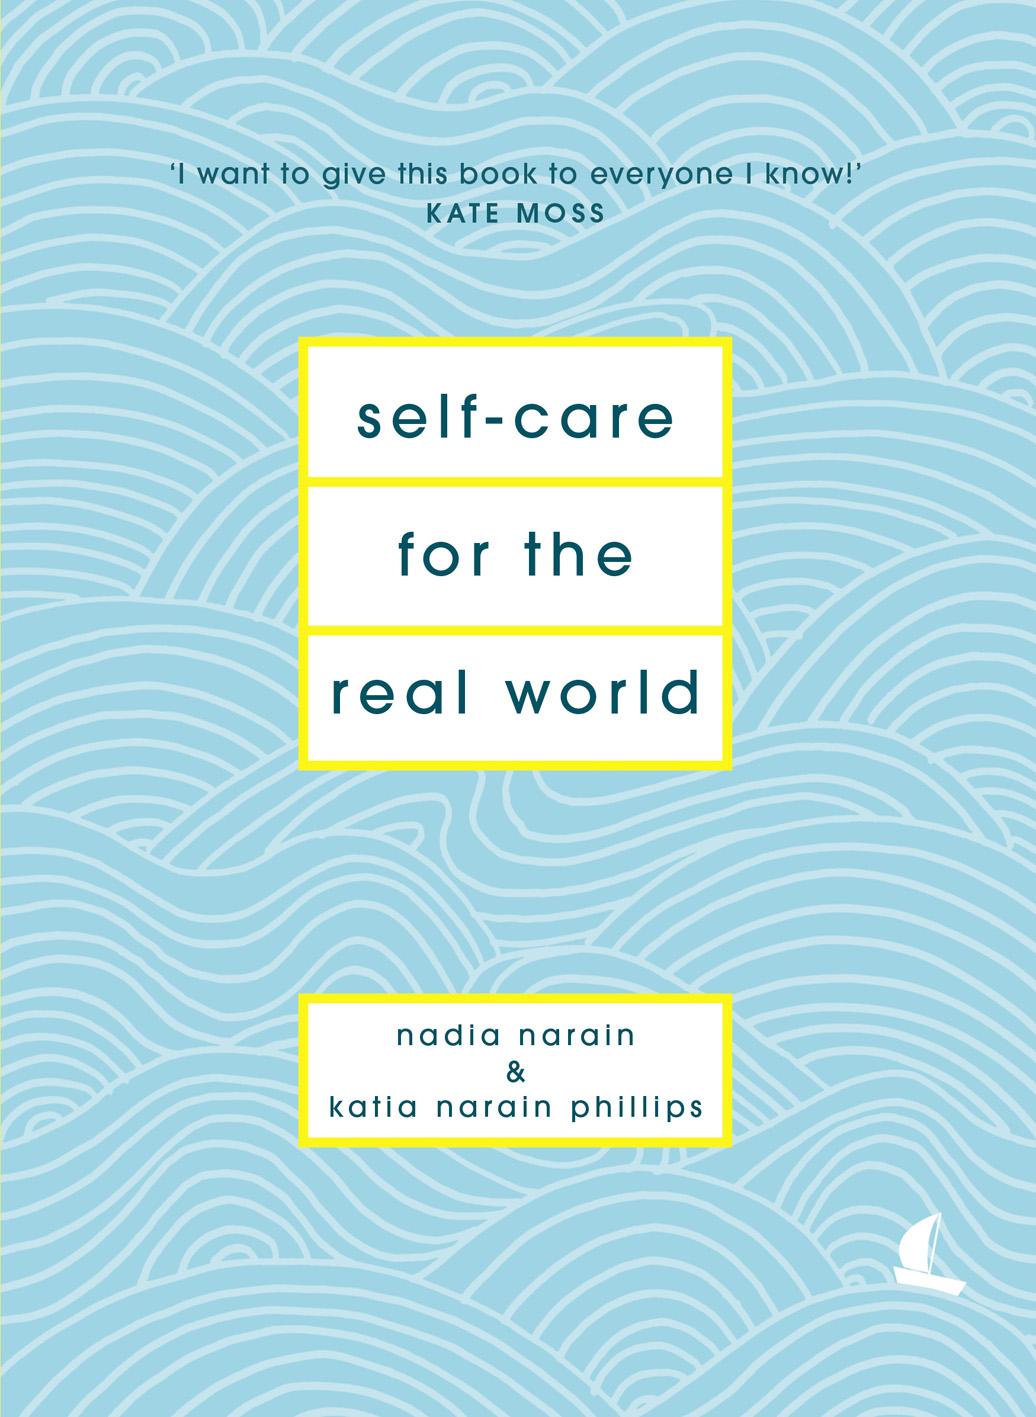 Self-Care For The Real World - Nadia Narain & Katia Narain Phillips